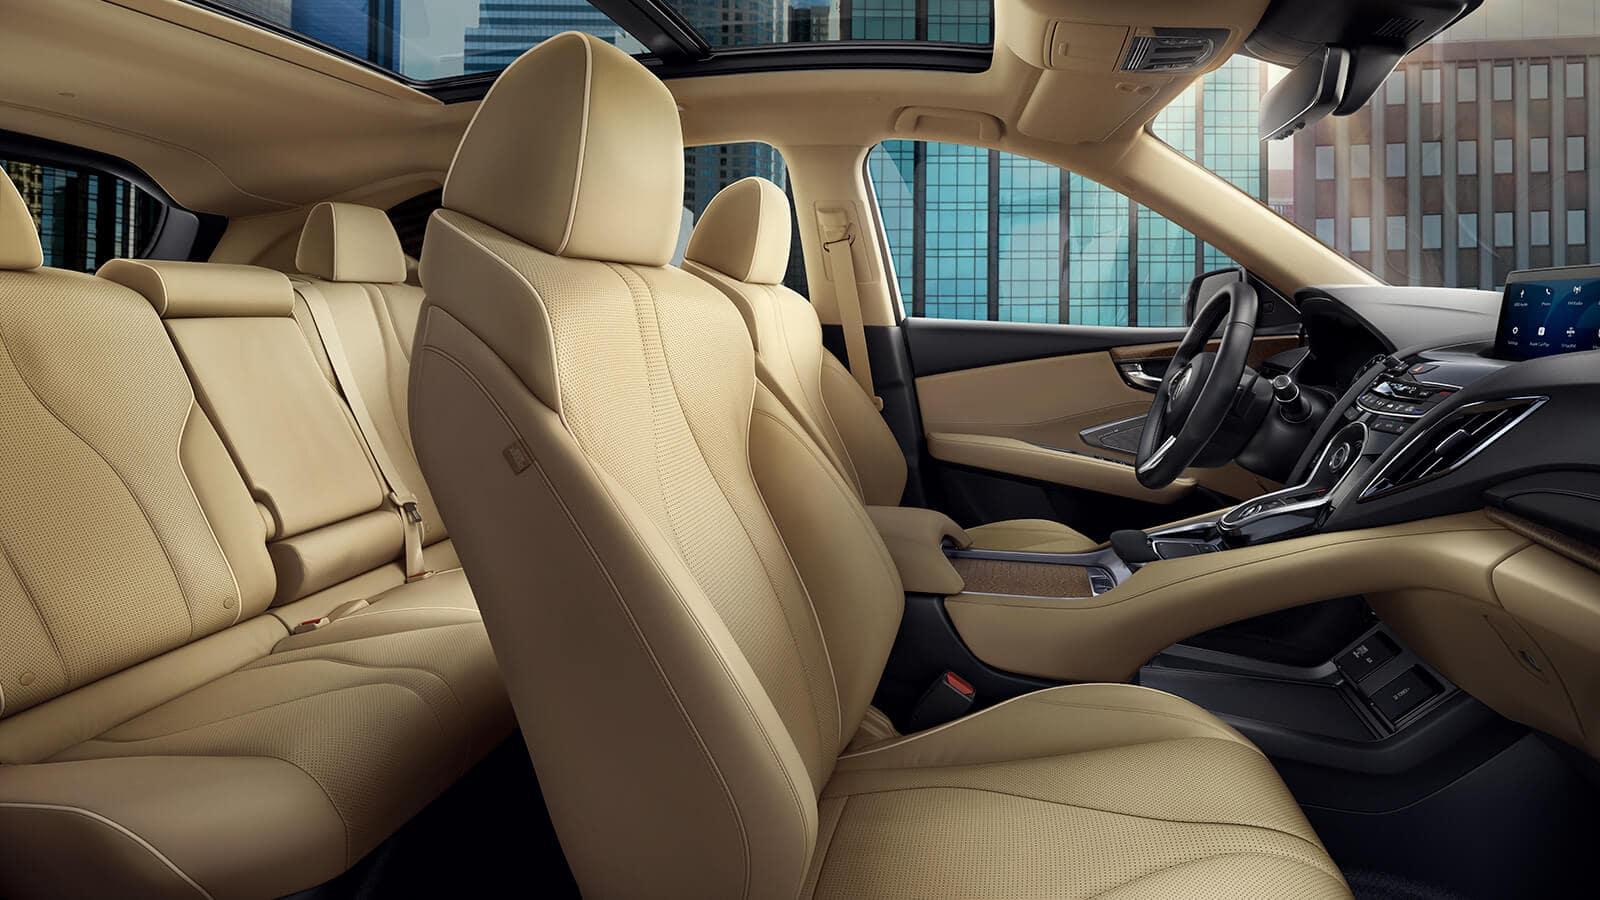 2020 Acura RDX Interior Cabin Seating Passenger Side